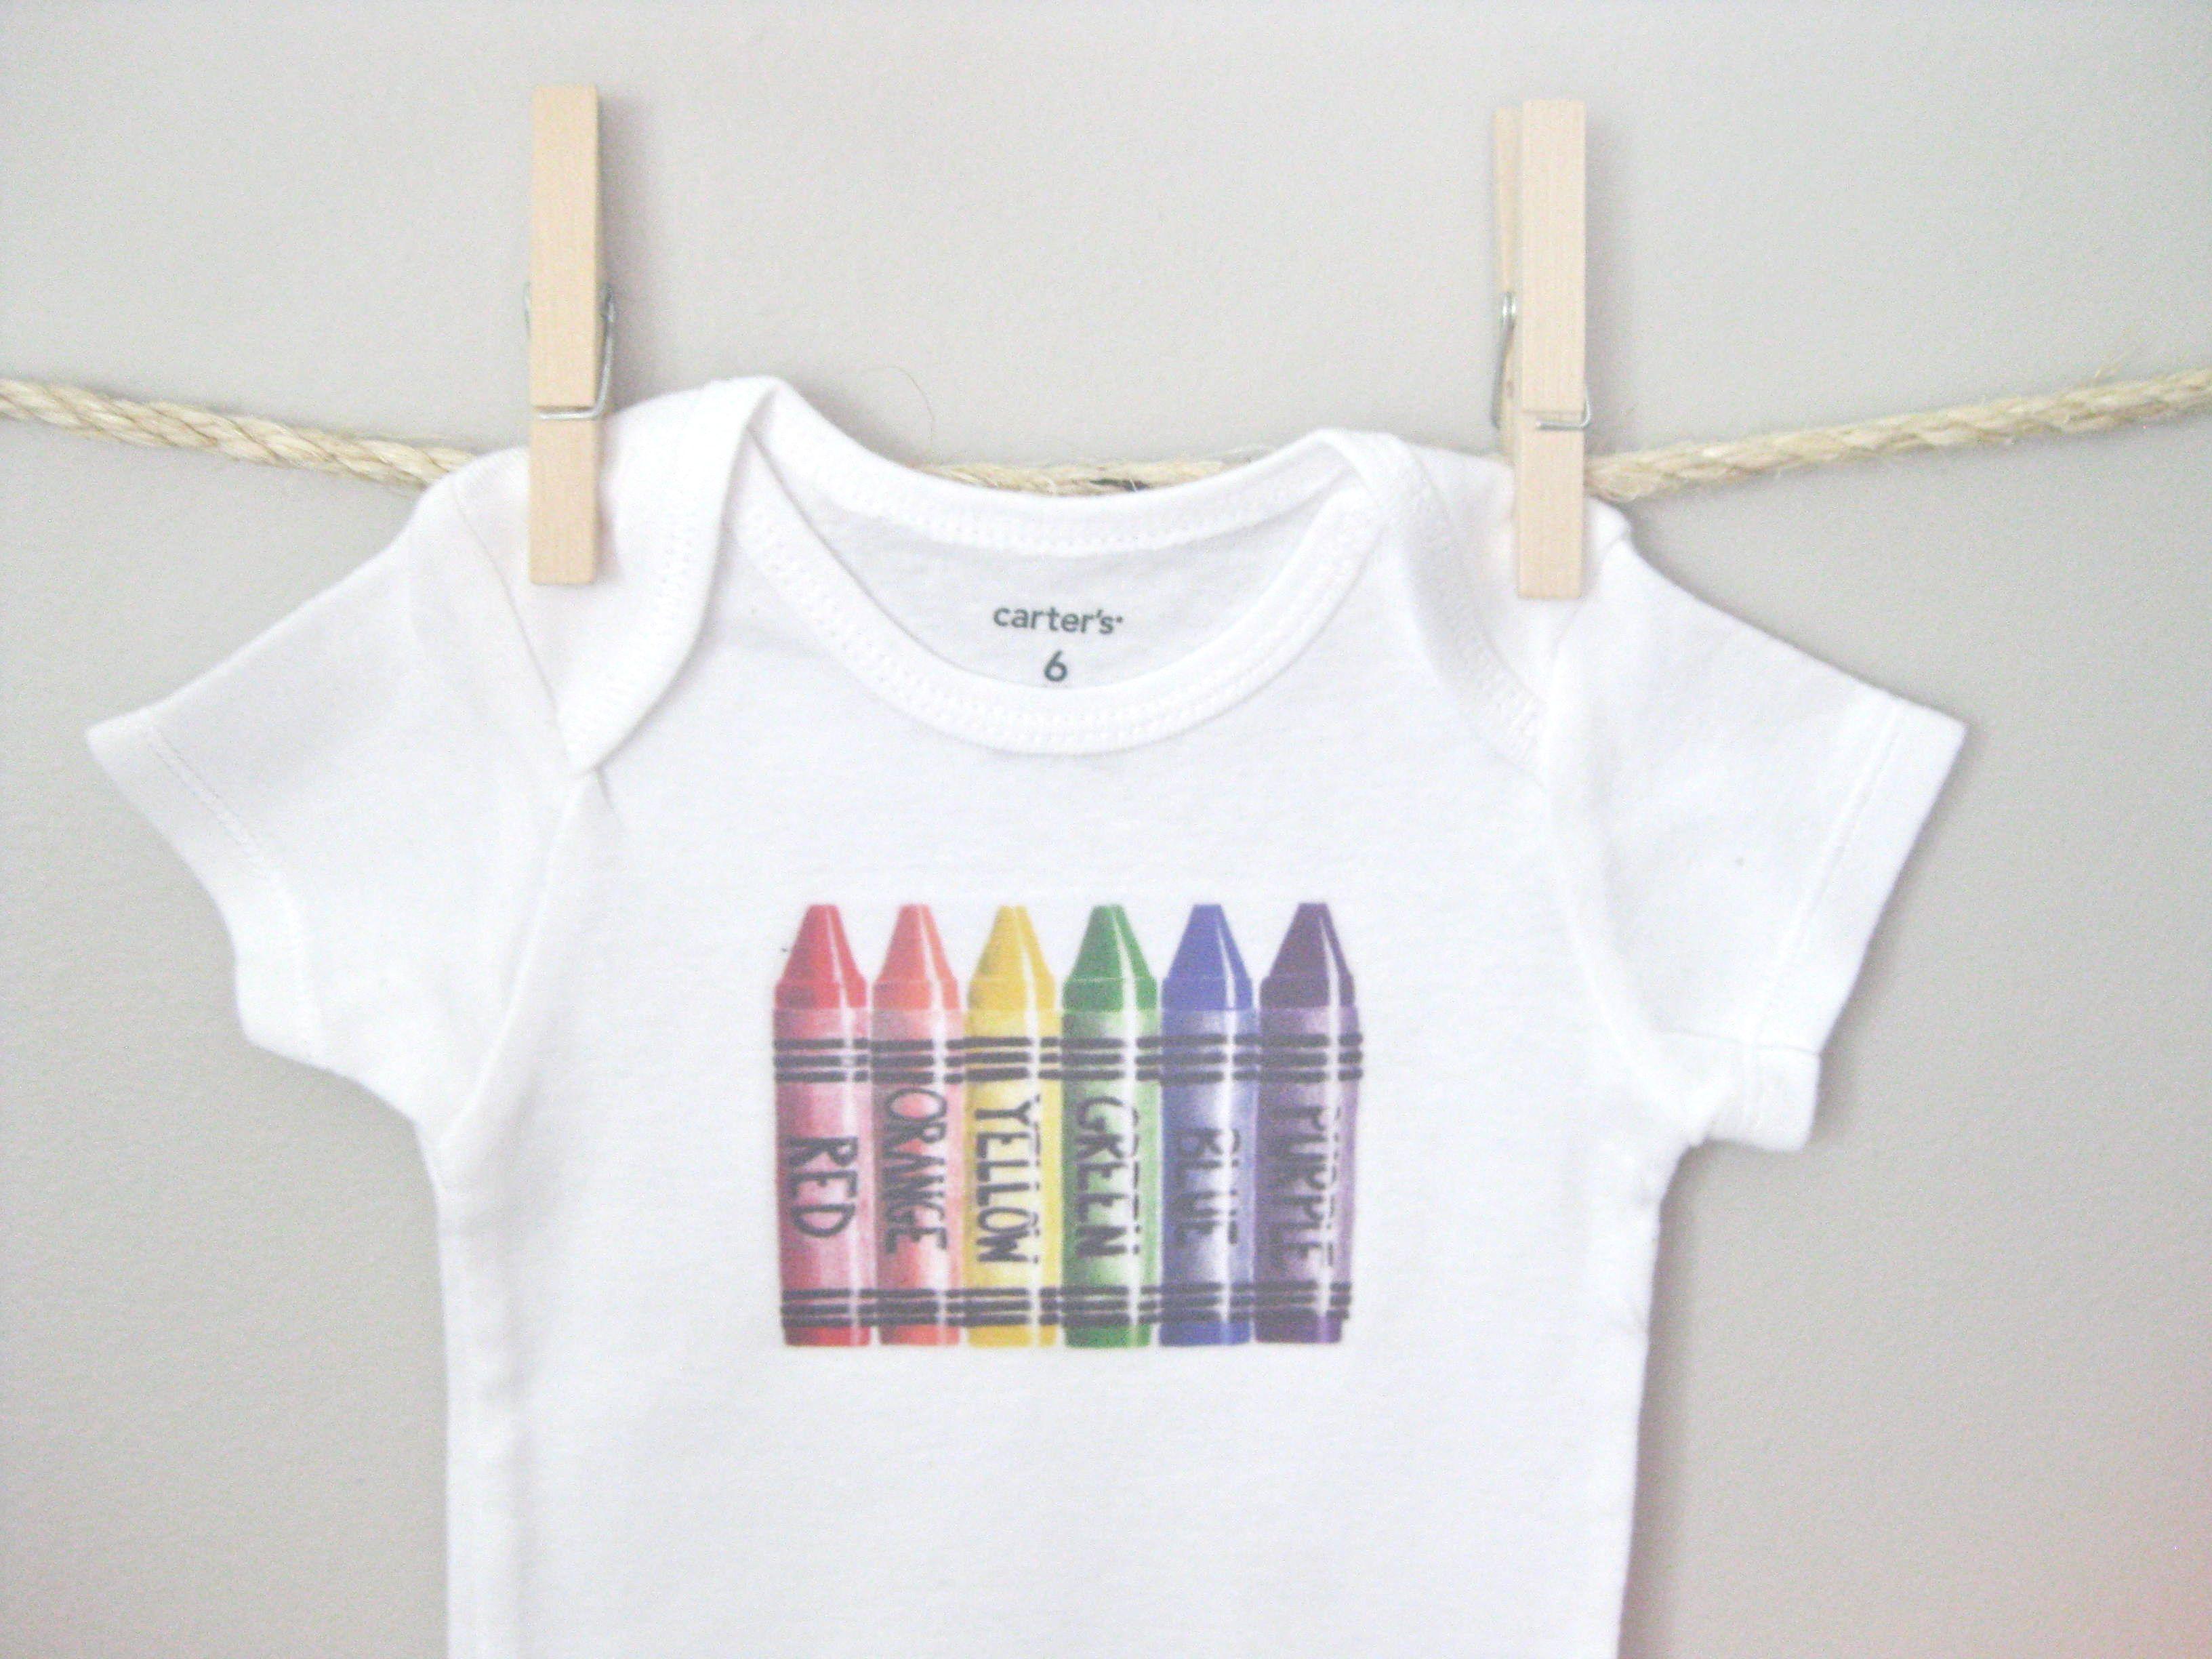 Crayon Shirt, Boys Bodysuit, Gender Neutral Baby, Girls Bodysuit, Gender Neutral Clothes, New Baby, Short or Long Sleeve, You Choose Size